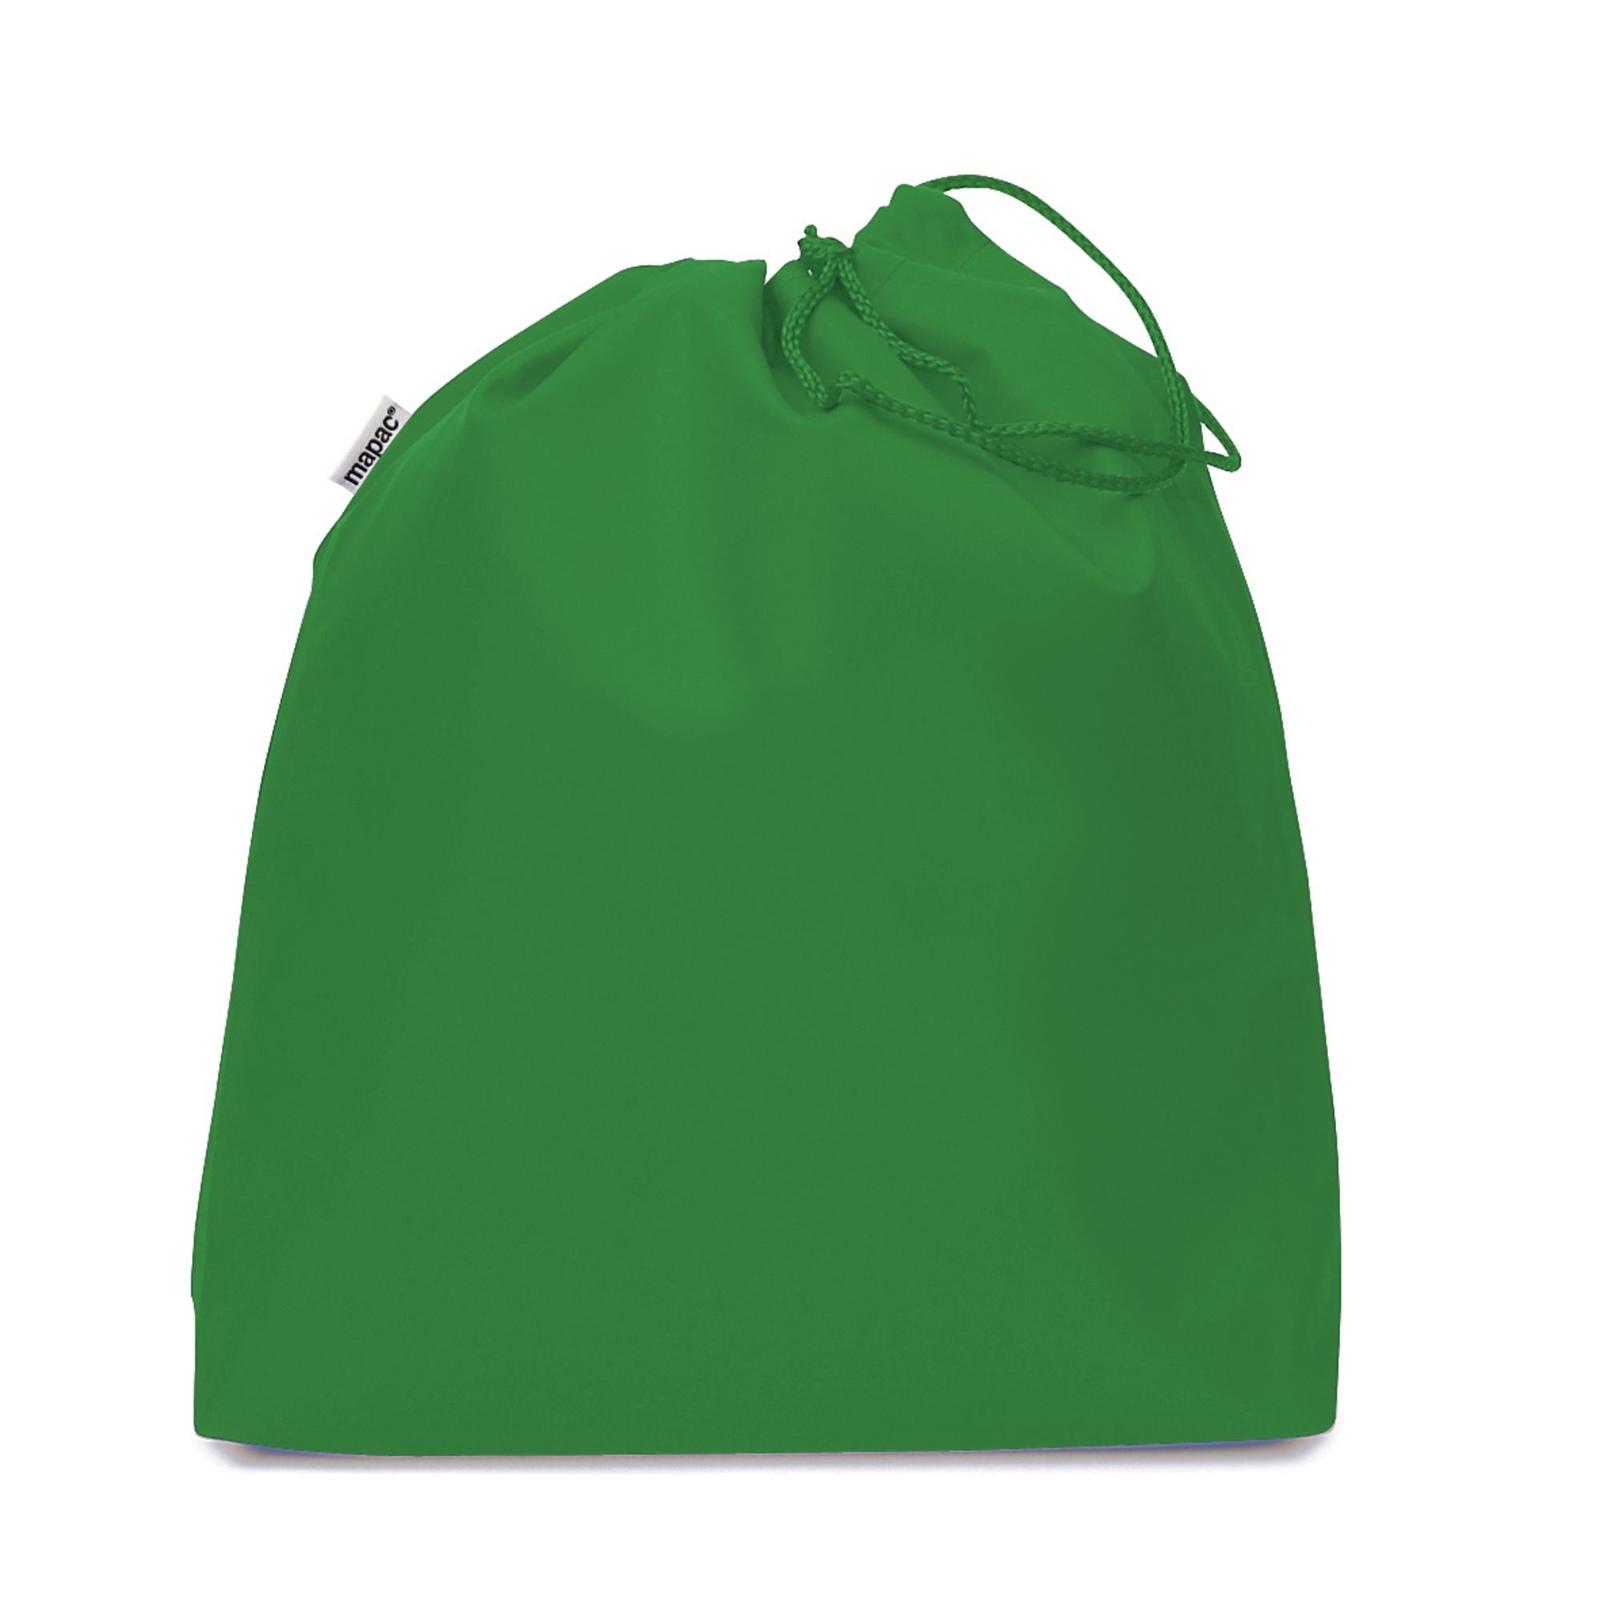 Plain Gym Bag Emerald - Pack of 25